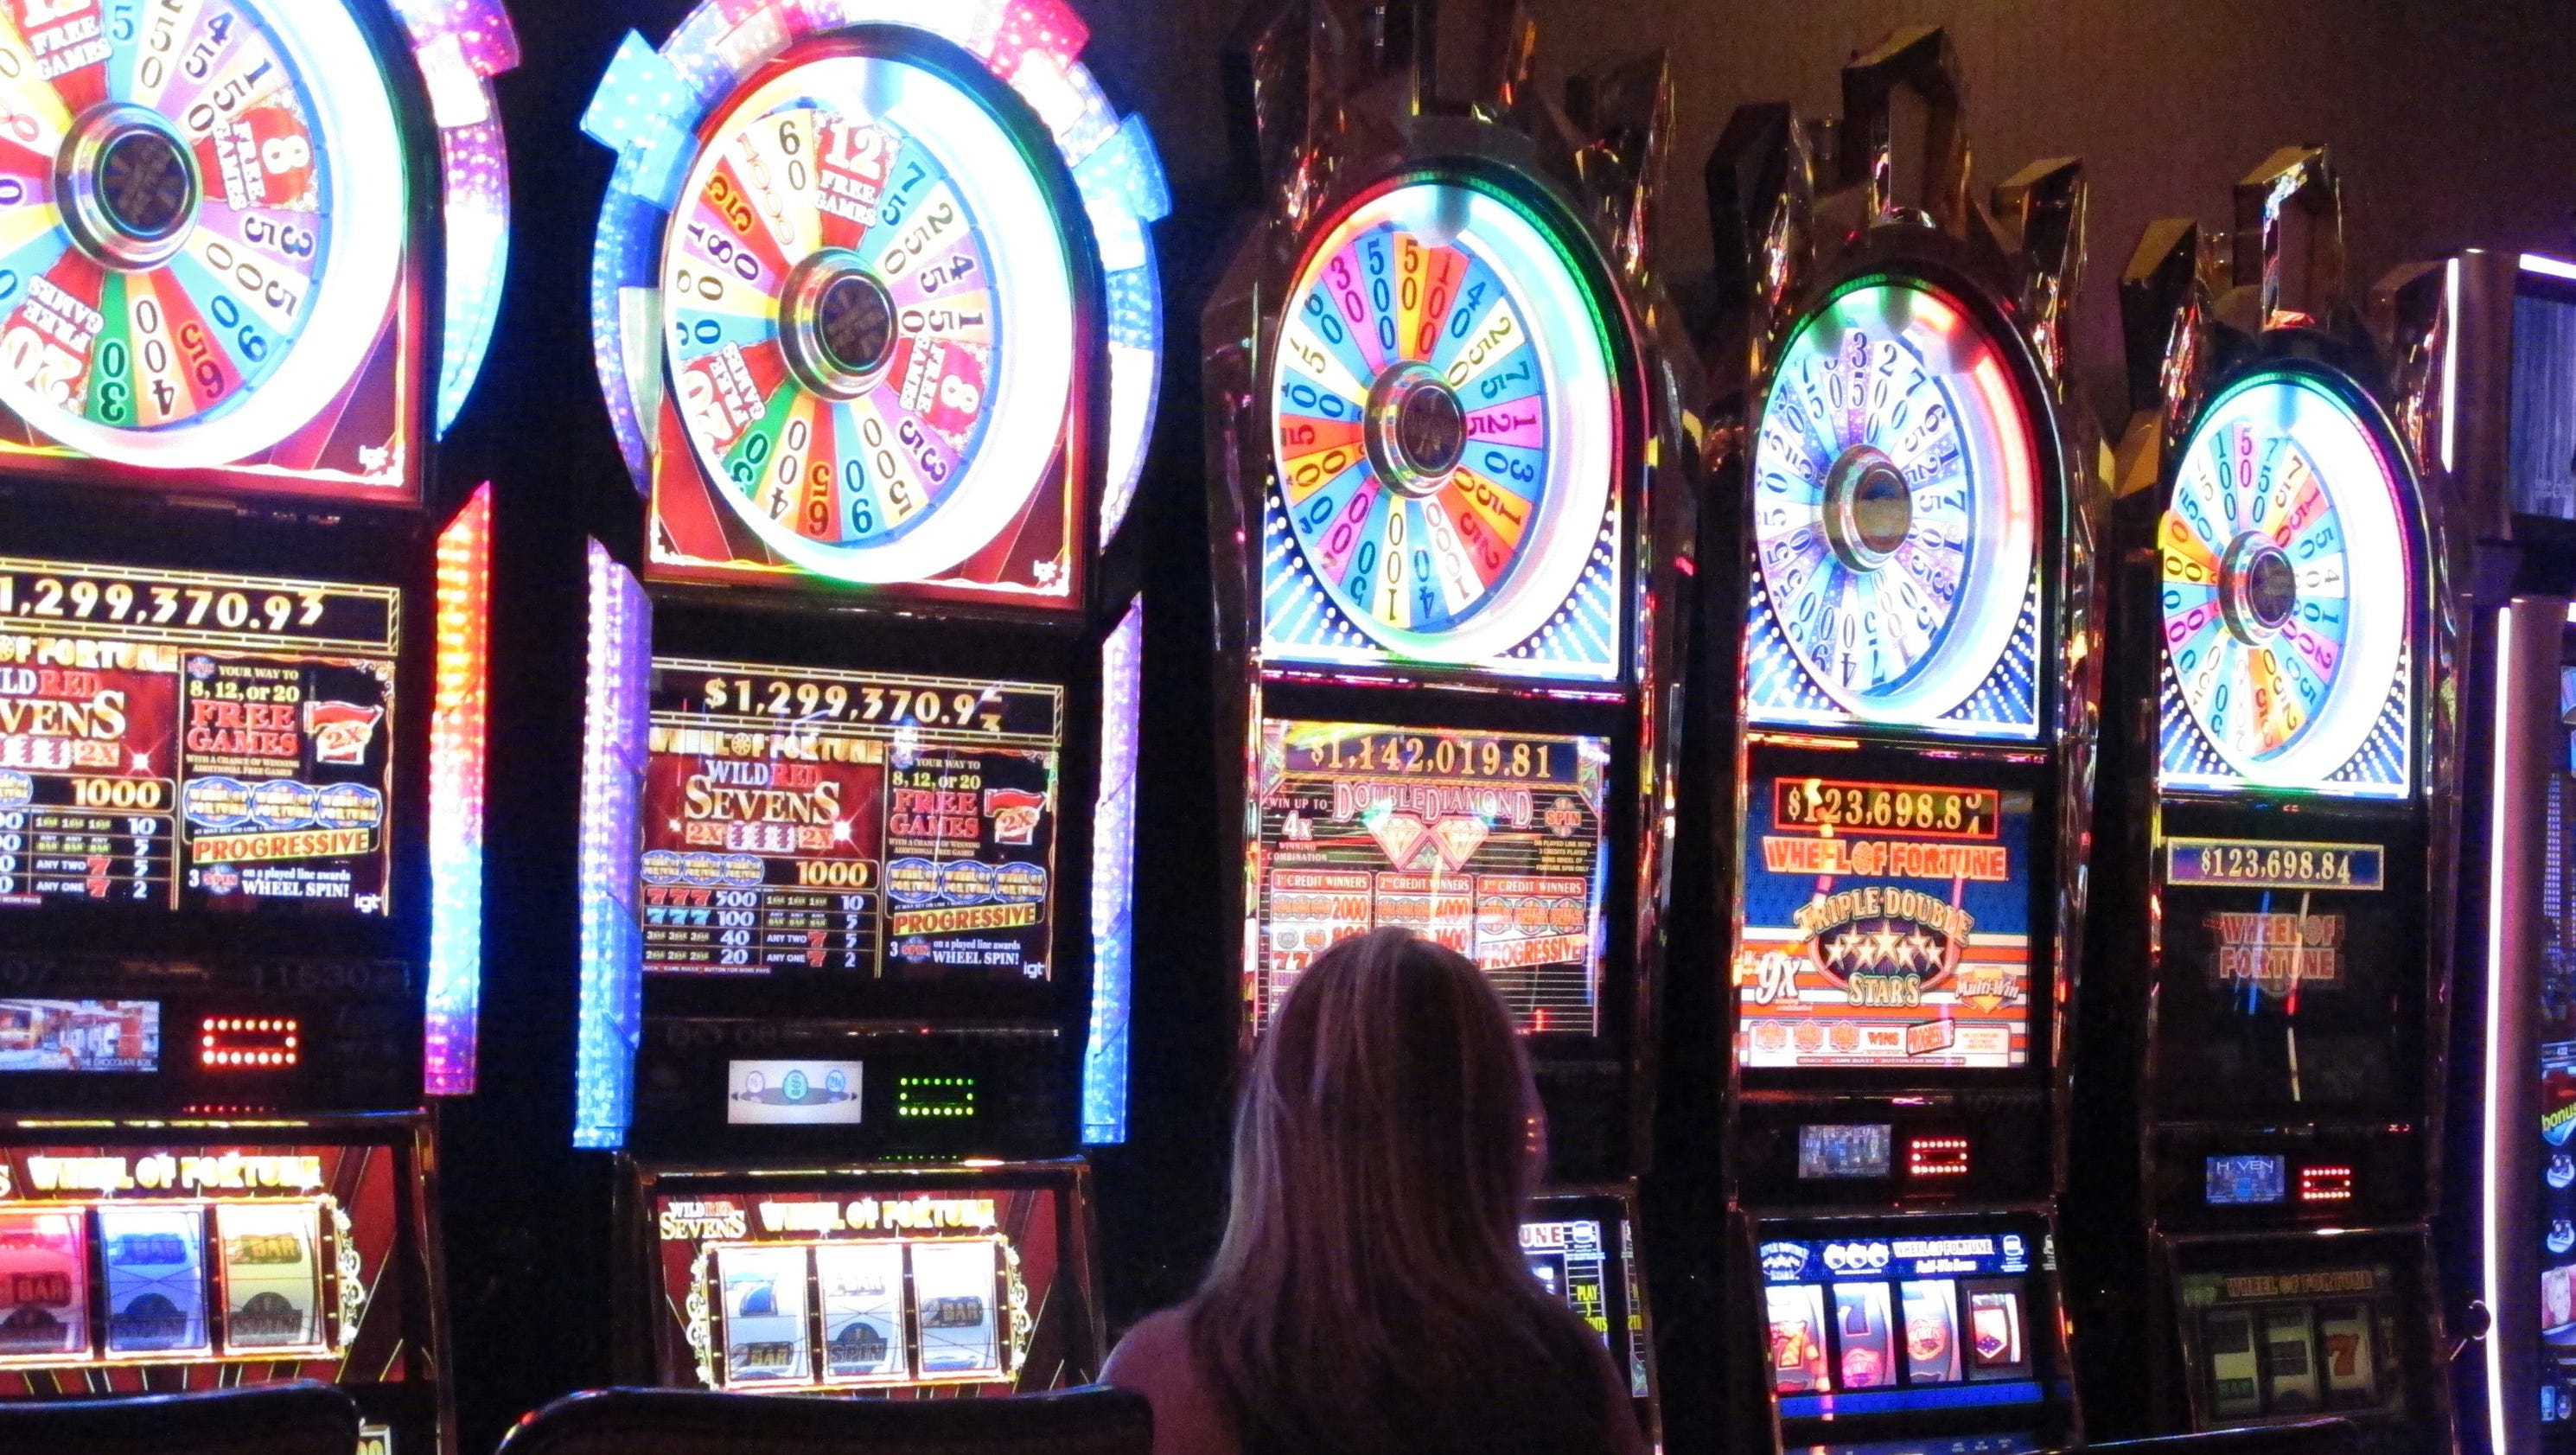 Stan fulton casino owner video slot machine pioneer dies for List of slot machines at motor city casino